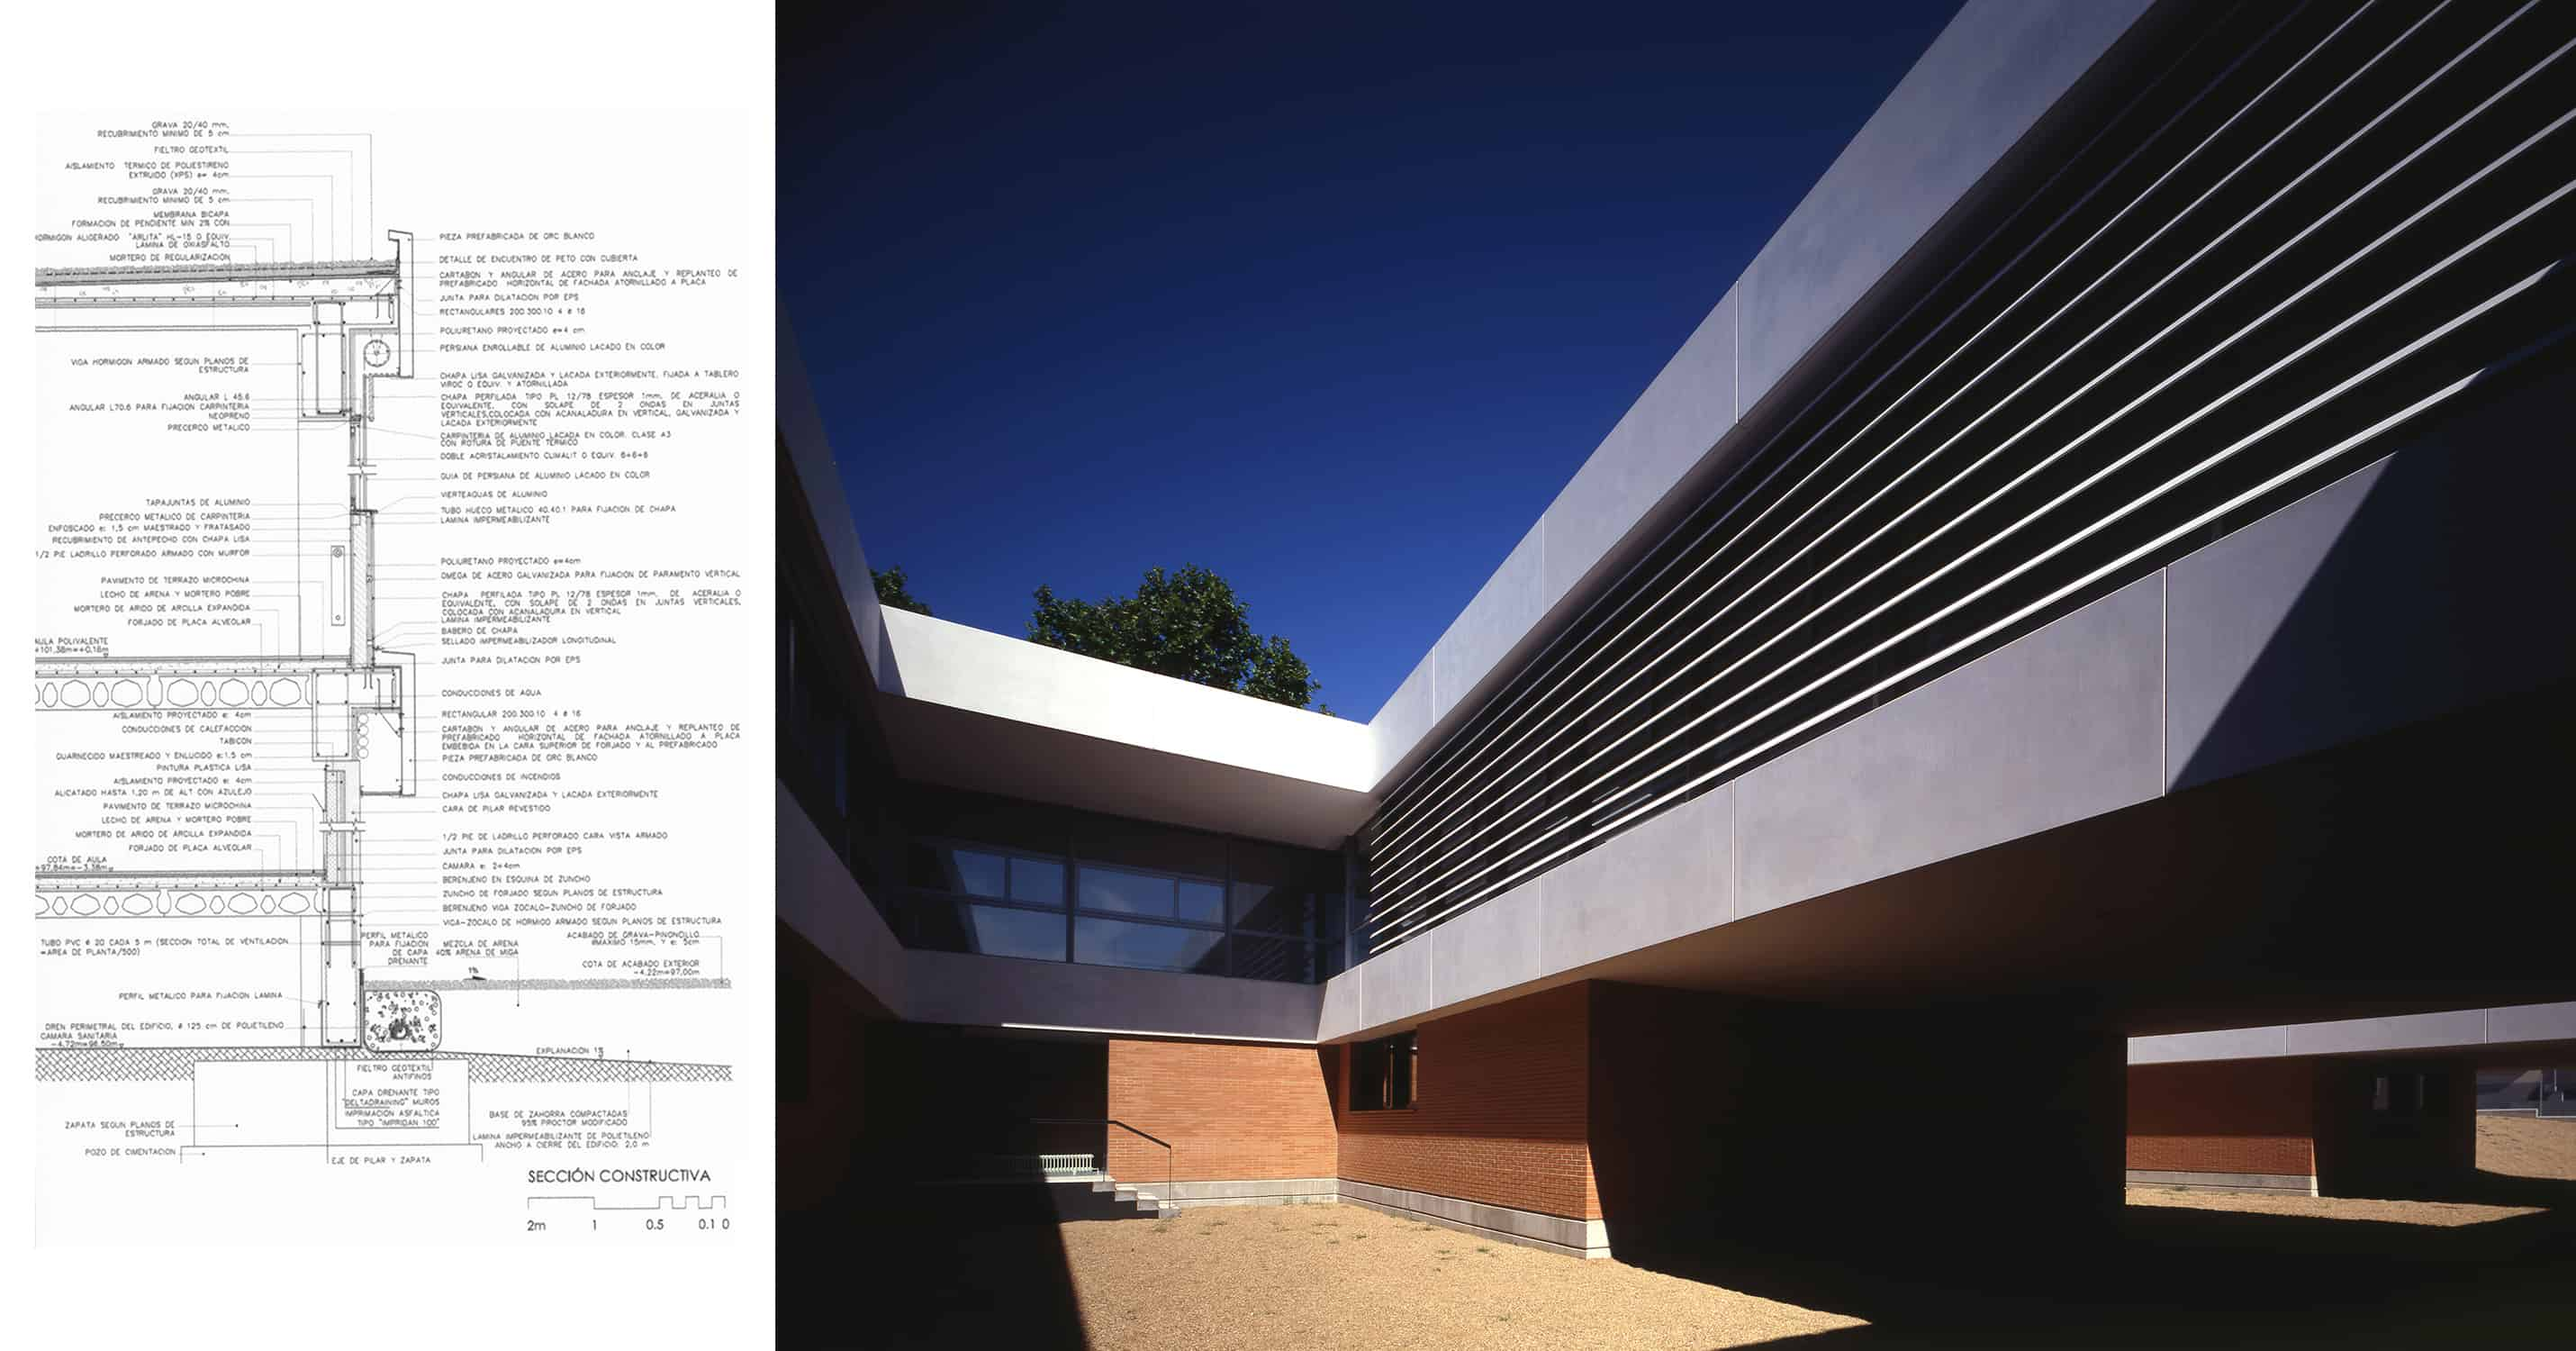 LANDINEZ+REY | equipo L2G arquitectos, slp [ eL2Gaa ] - foto: Juliana Freitas Amaral